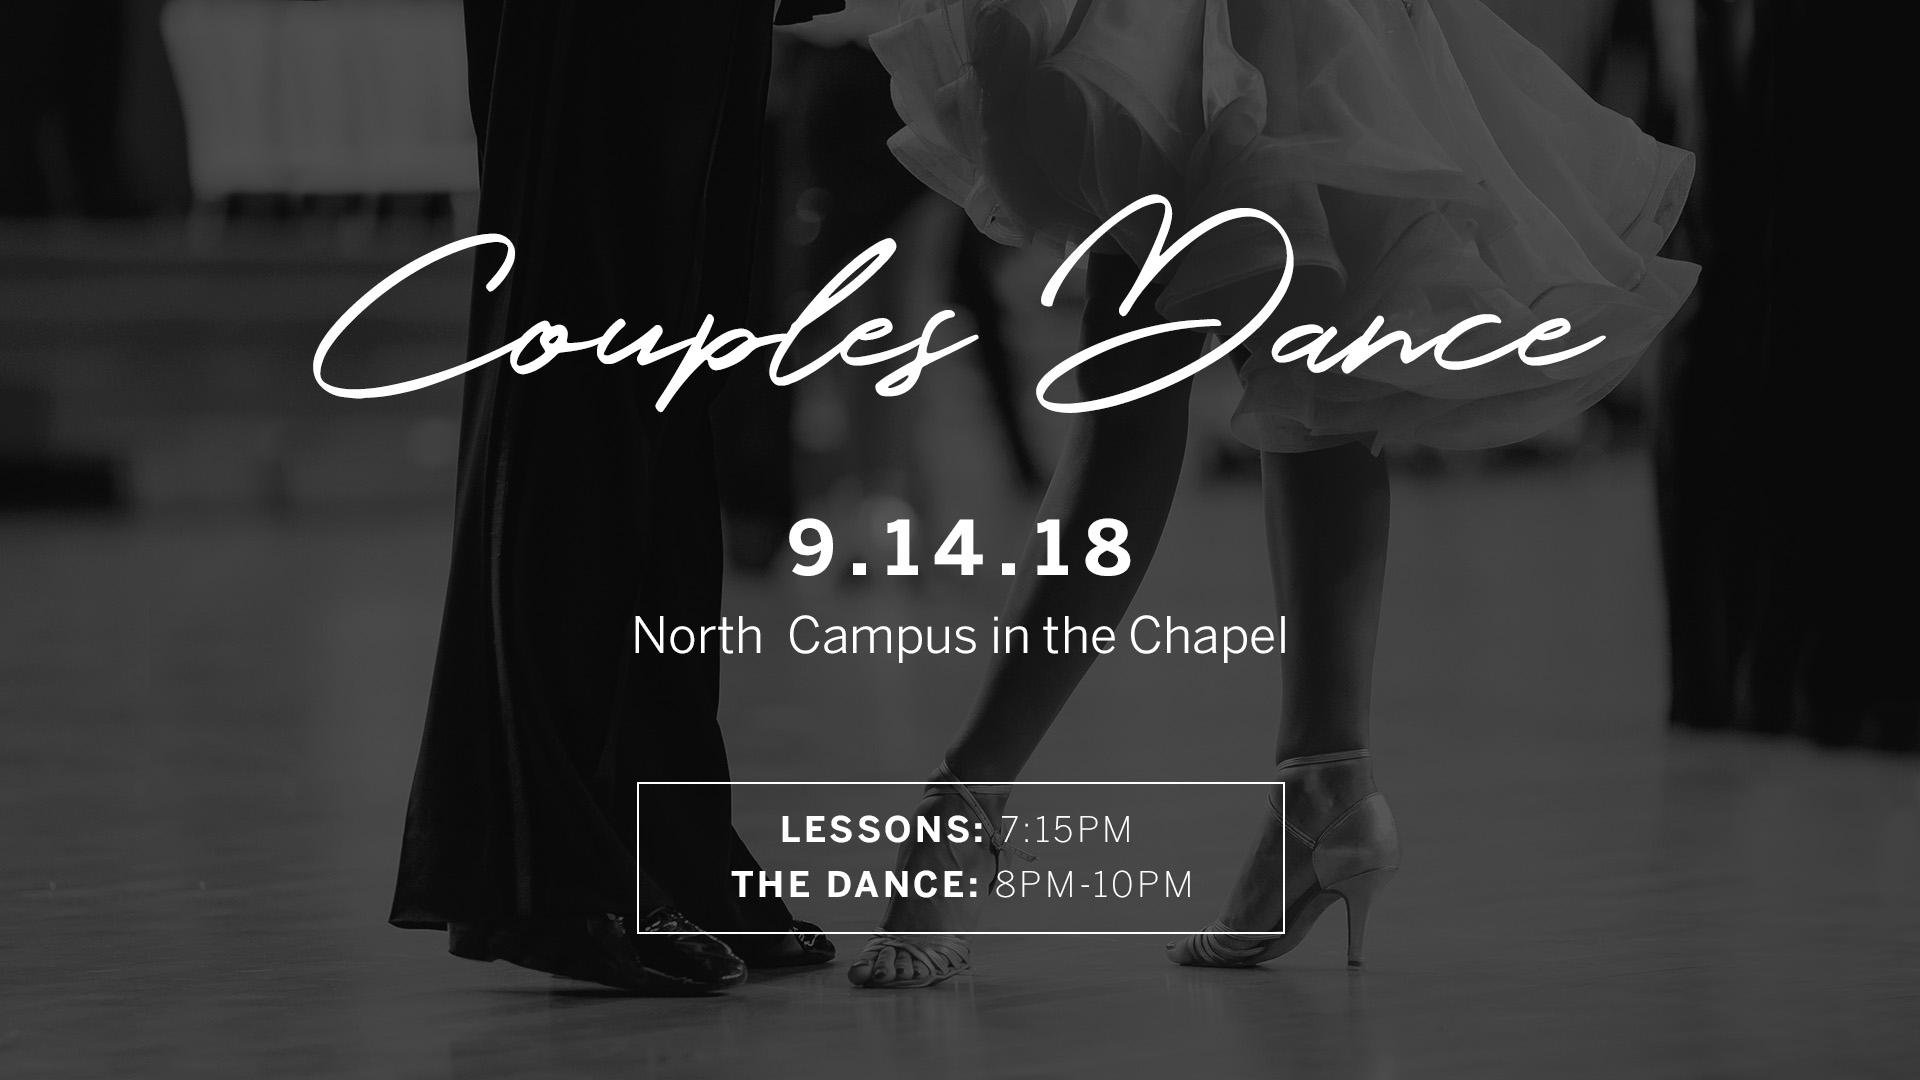 Couples dance 1920x1080